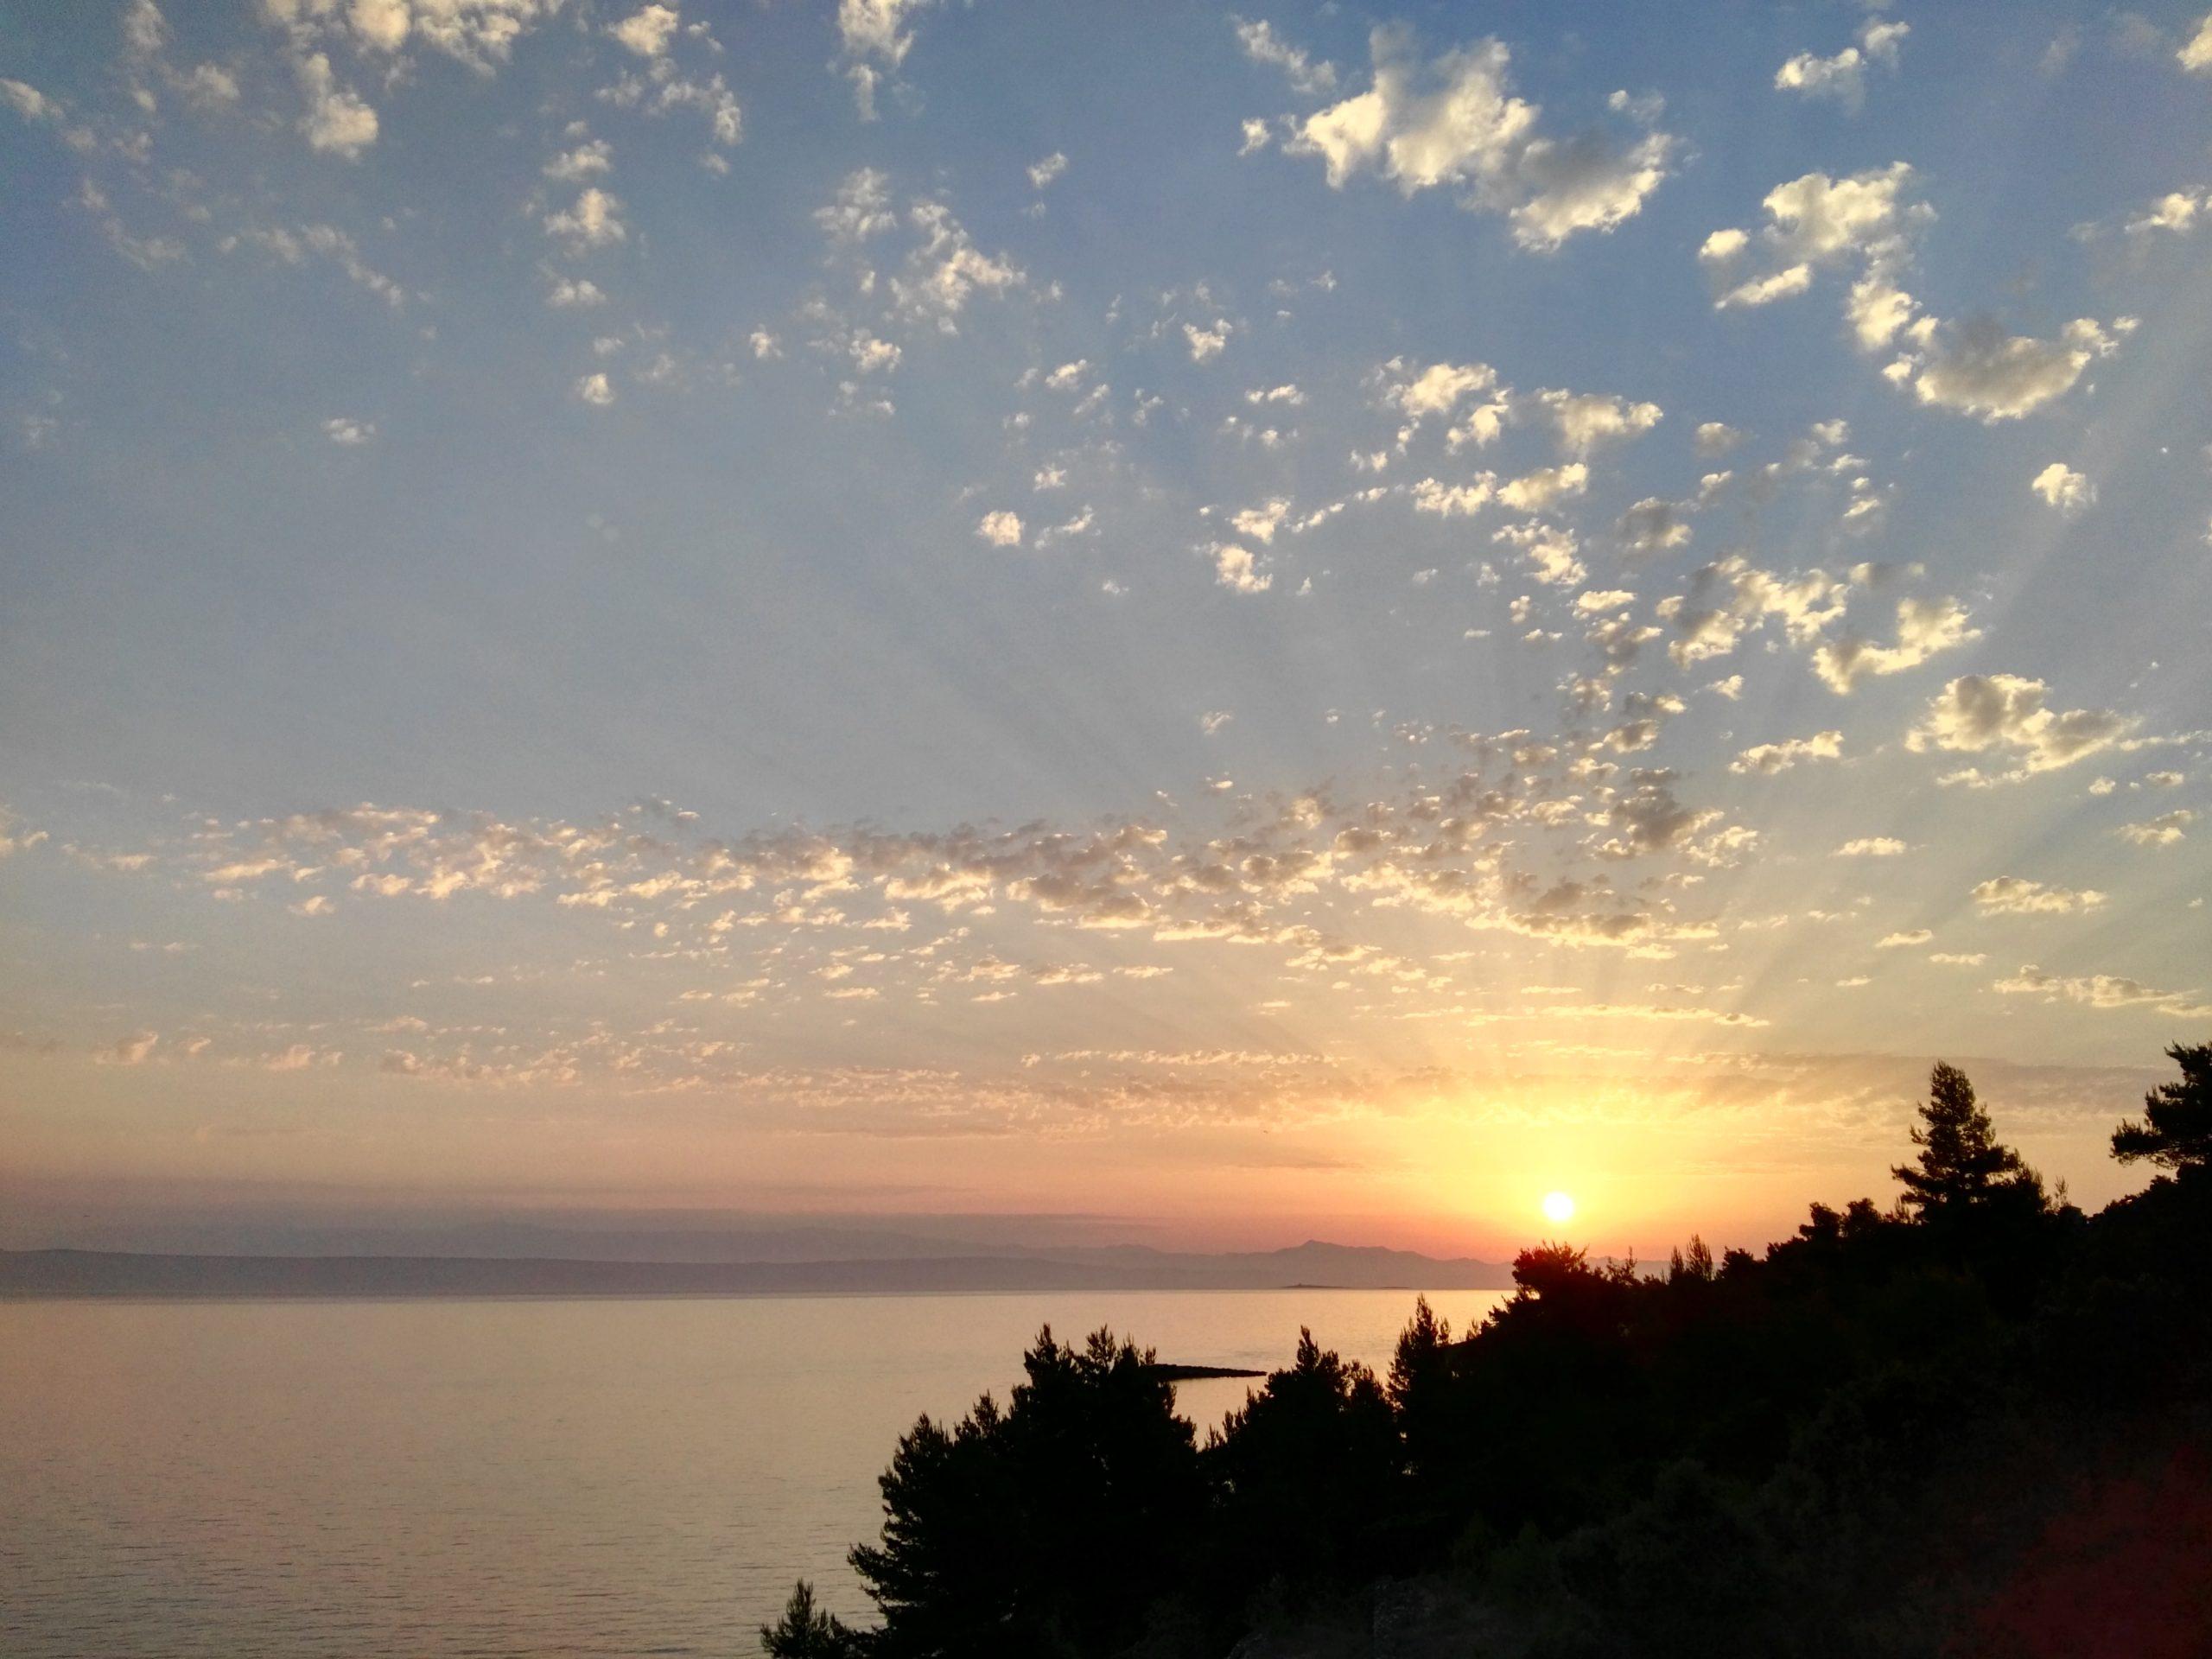 More kao sinonim za mir